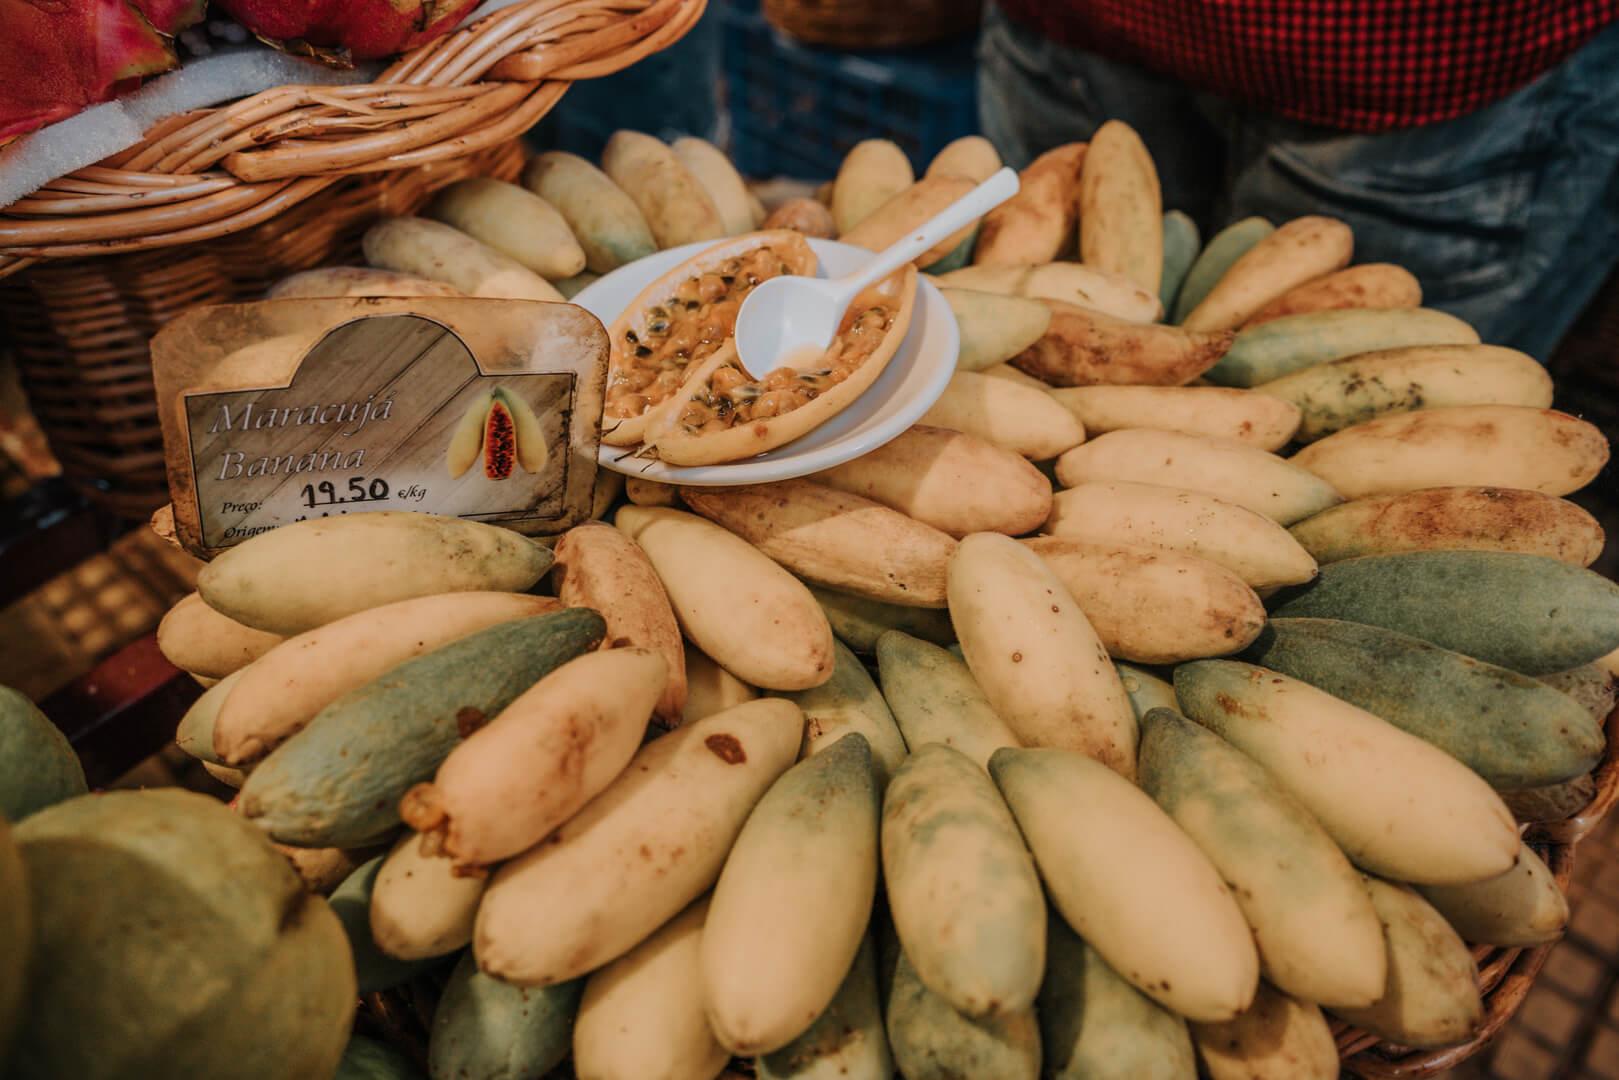 mercado de lavradores